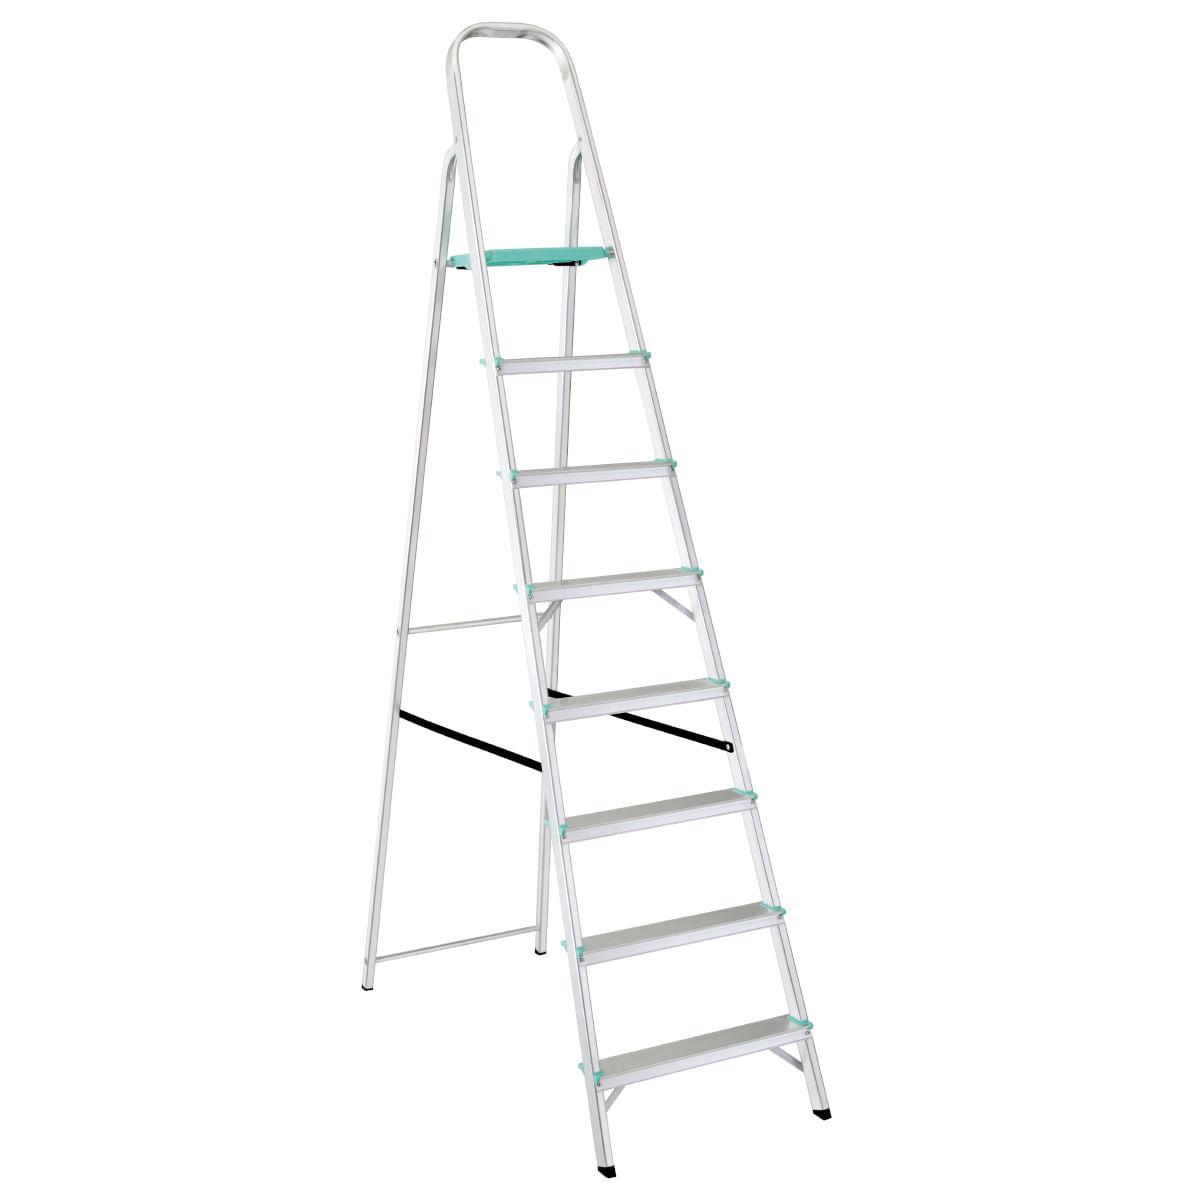 Escada de Alumínio Classic Tramontina 8 Degraus 91850108